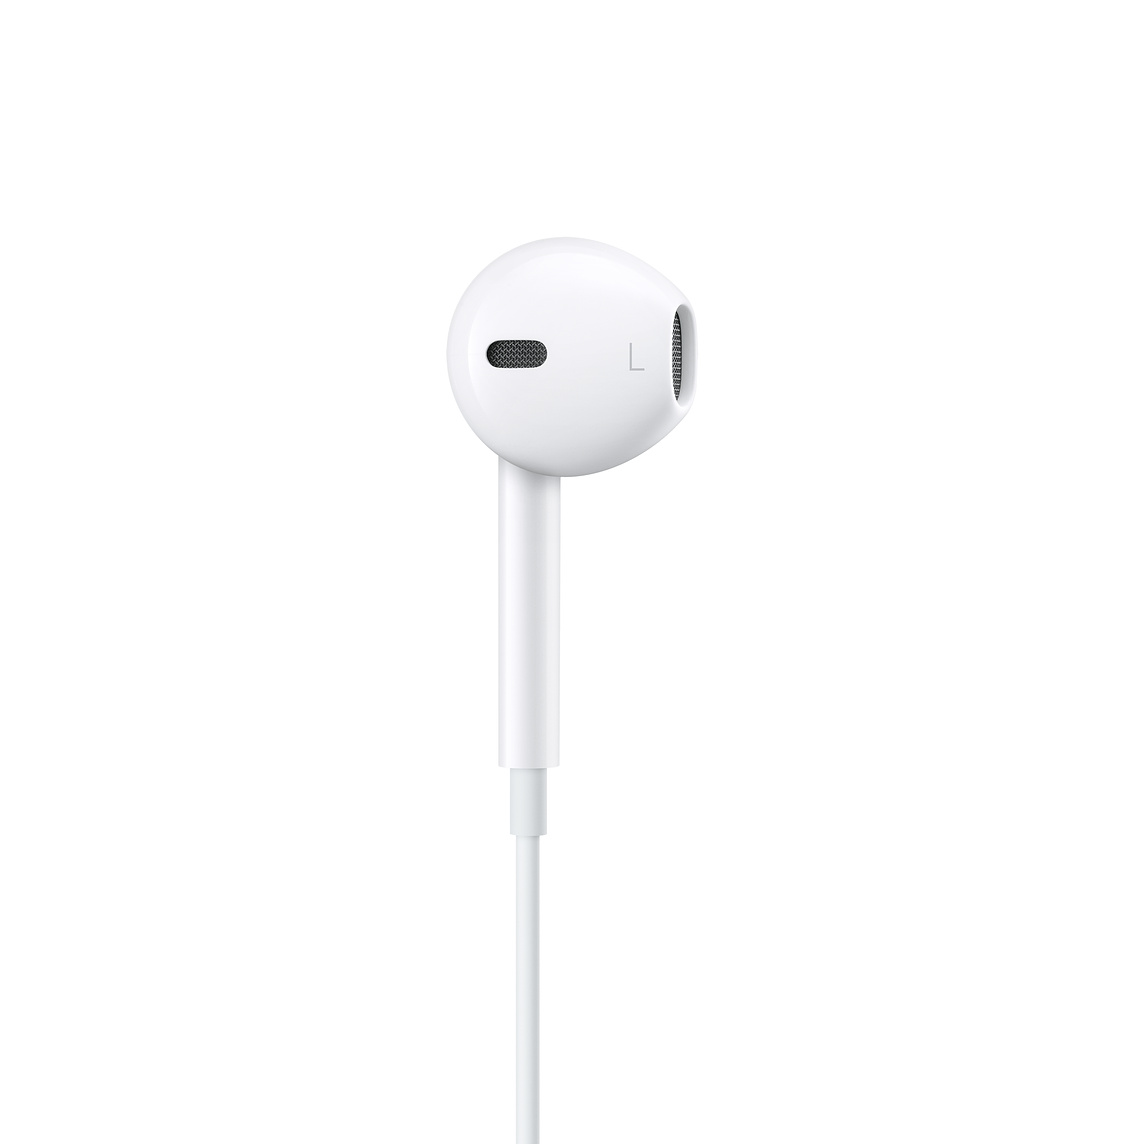 - Audífonos Apple Earpods con conector Lightning 3